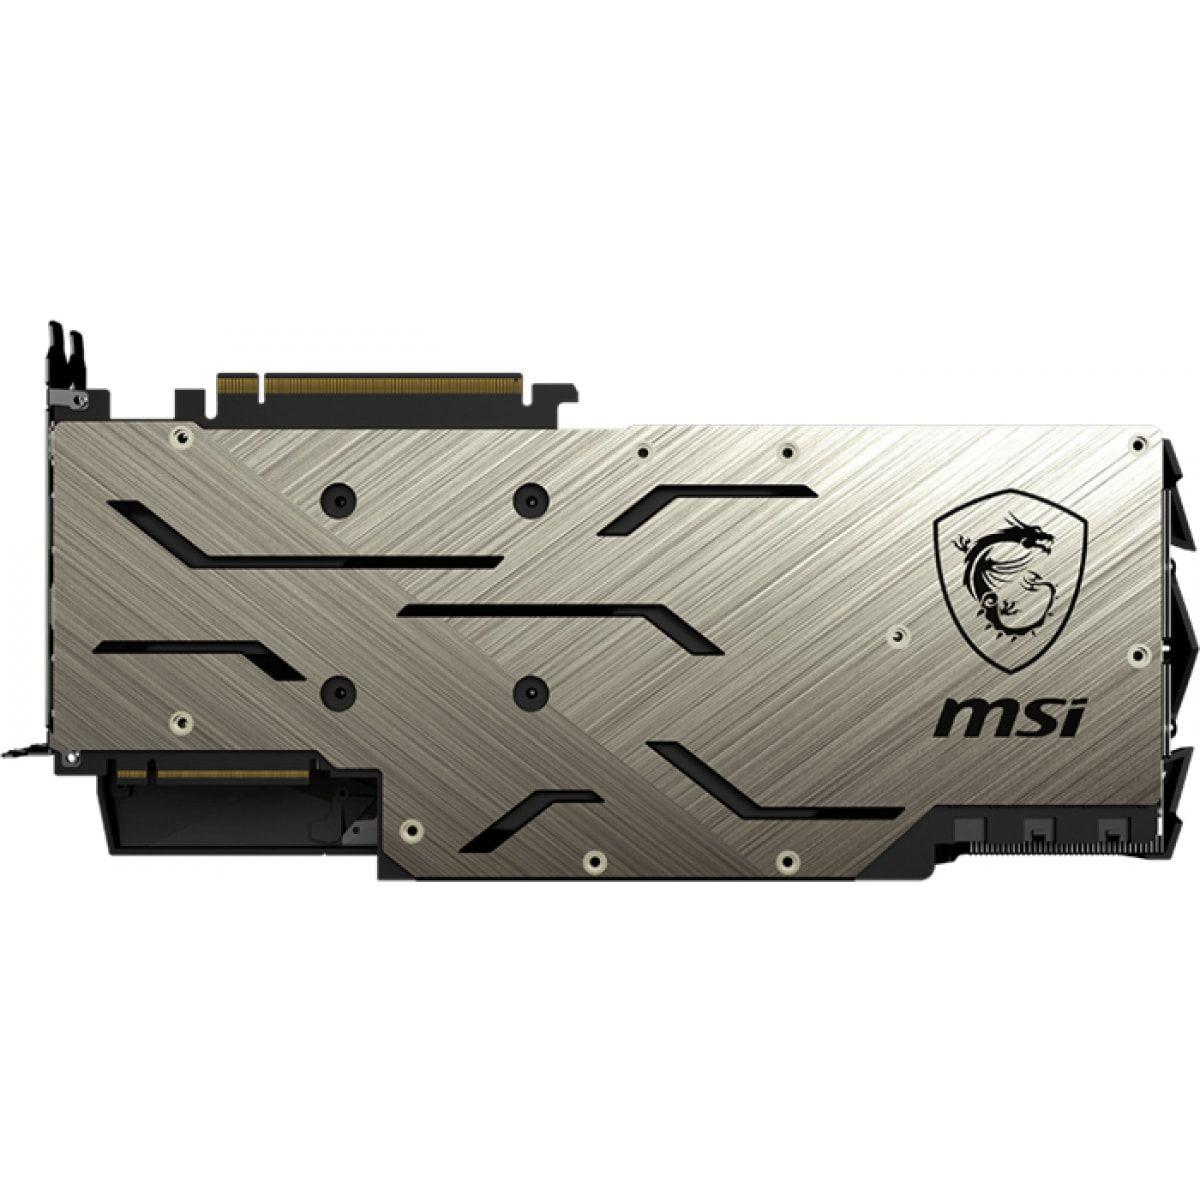 Placa de Video MSI Geforce RTX 2080 Gaming X Trio GDDR6  8GB 256 BITS - RTX 2080 Gaming X